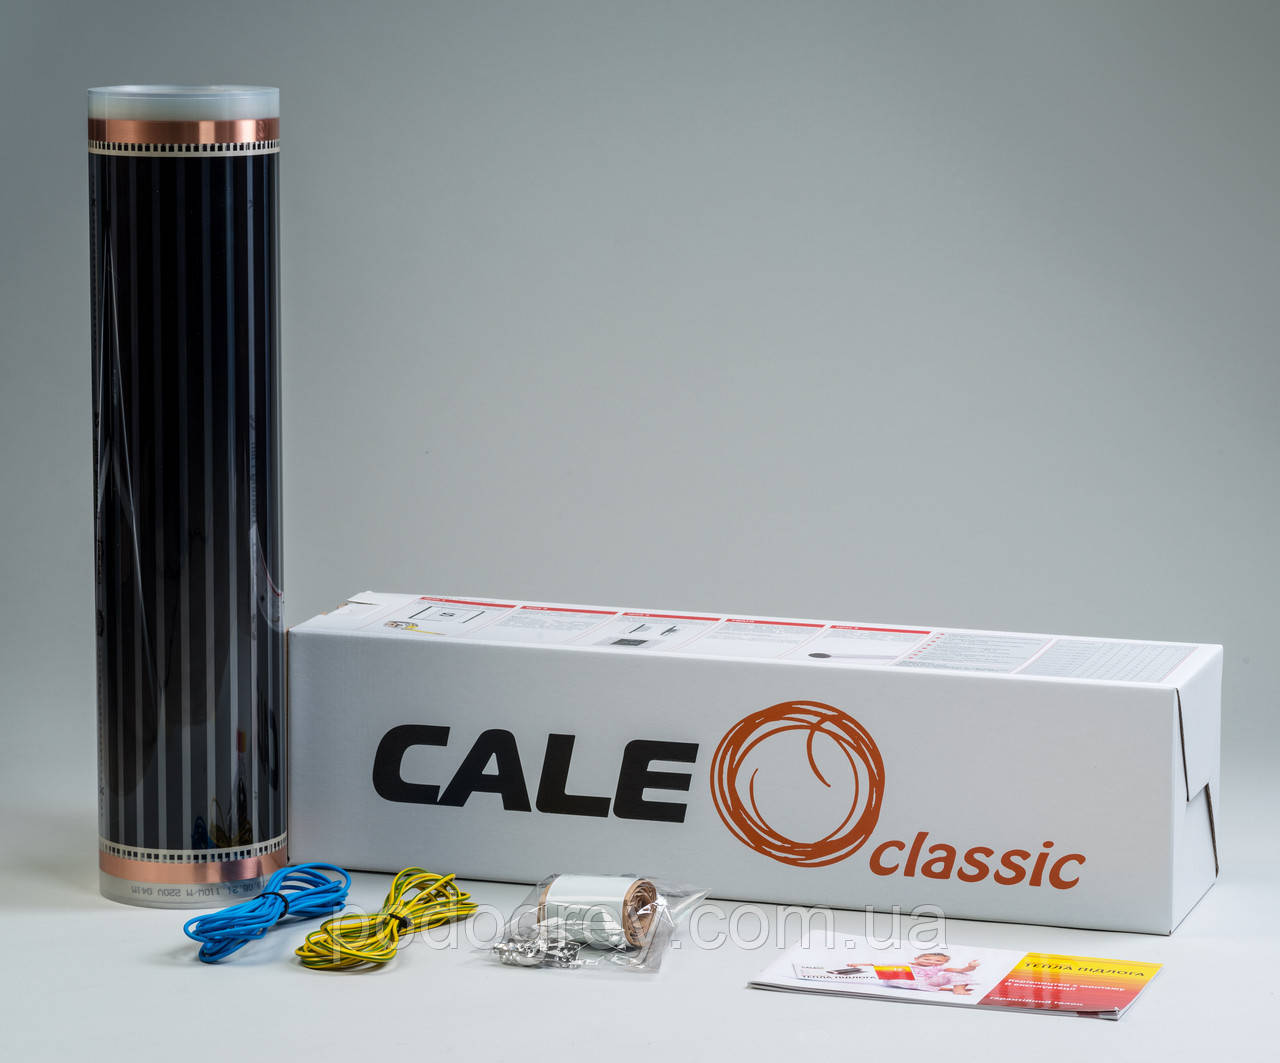 Теплый пол CALEO. Комплект Caleo classik 2 кв. м.